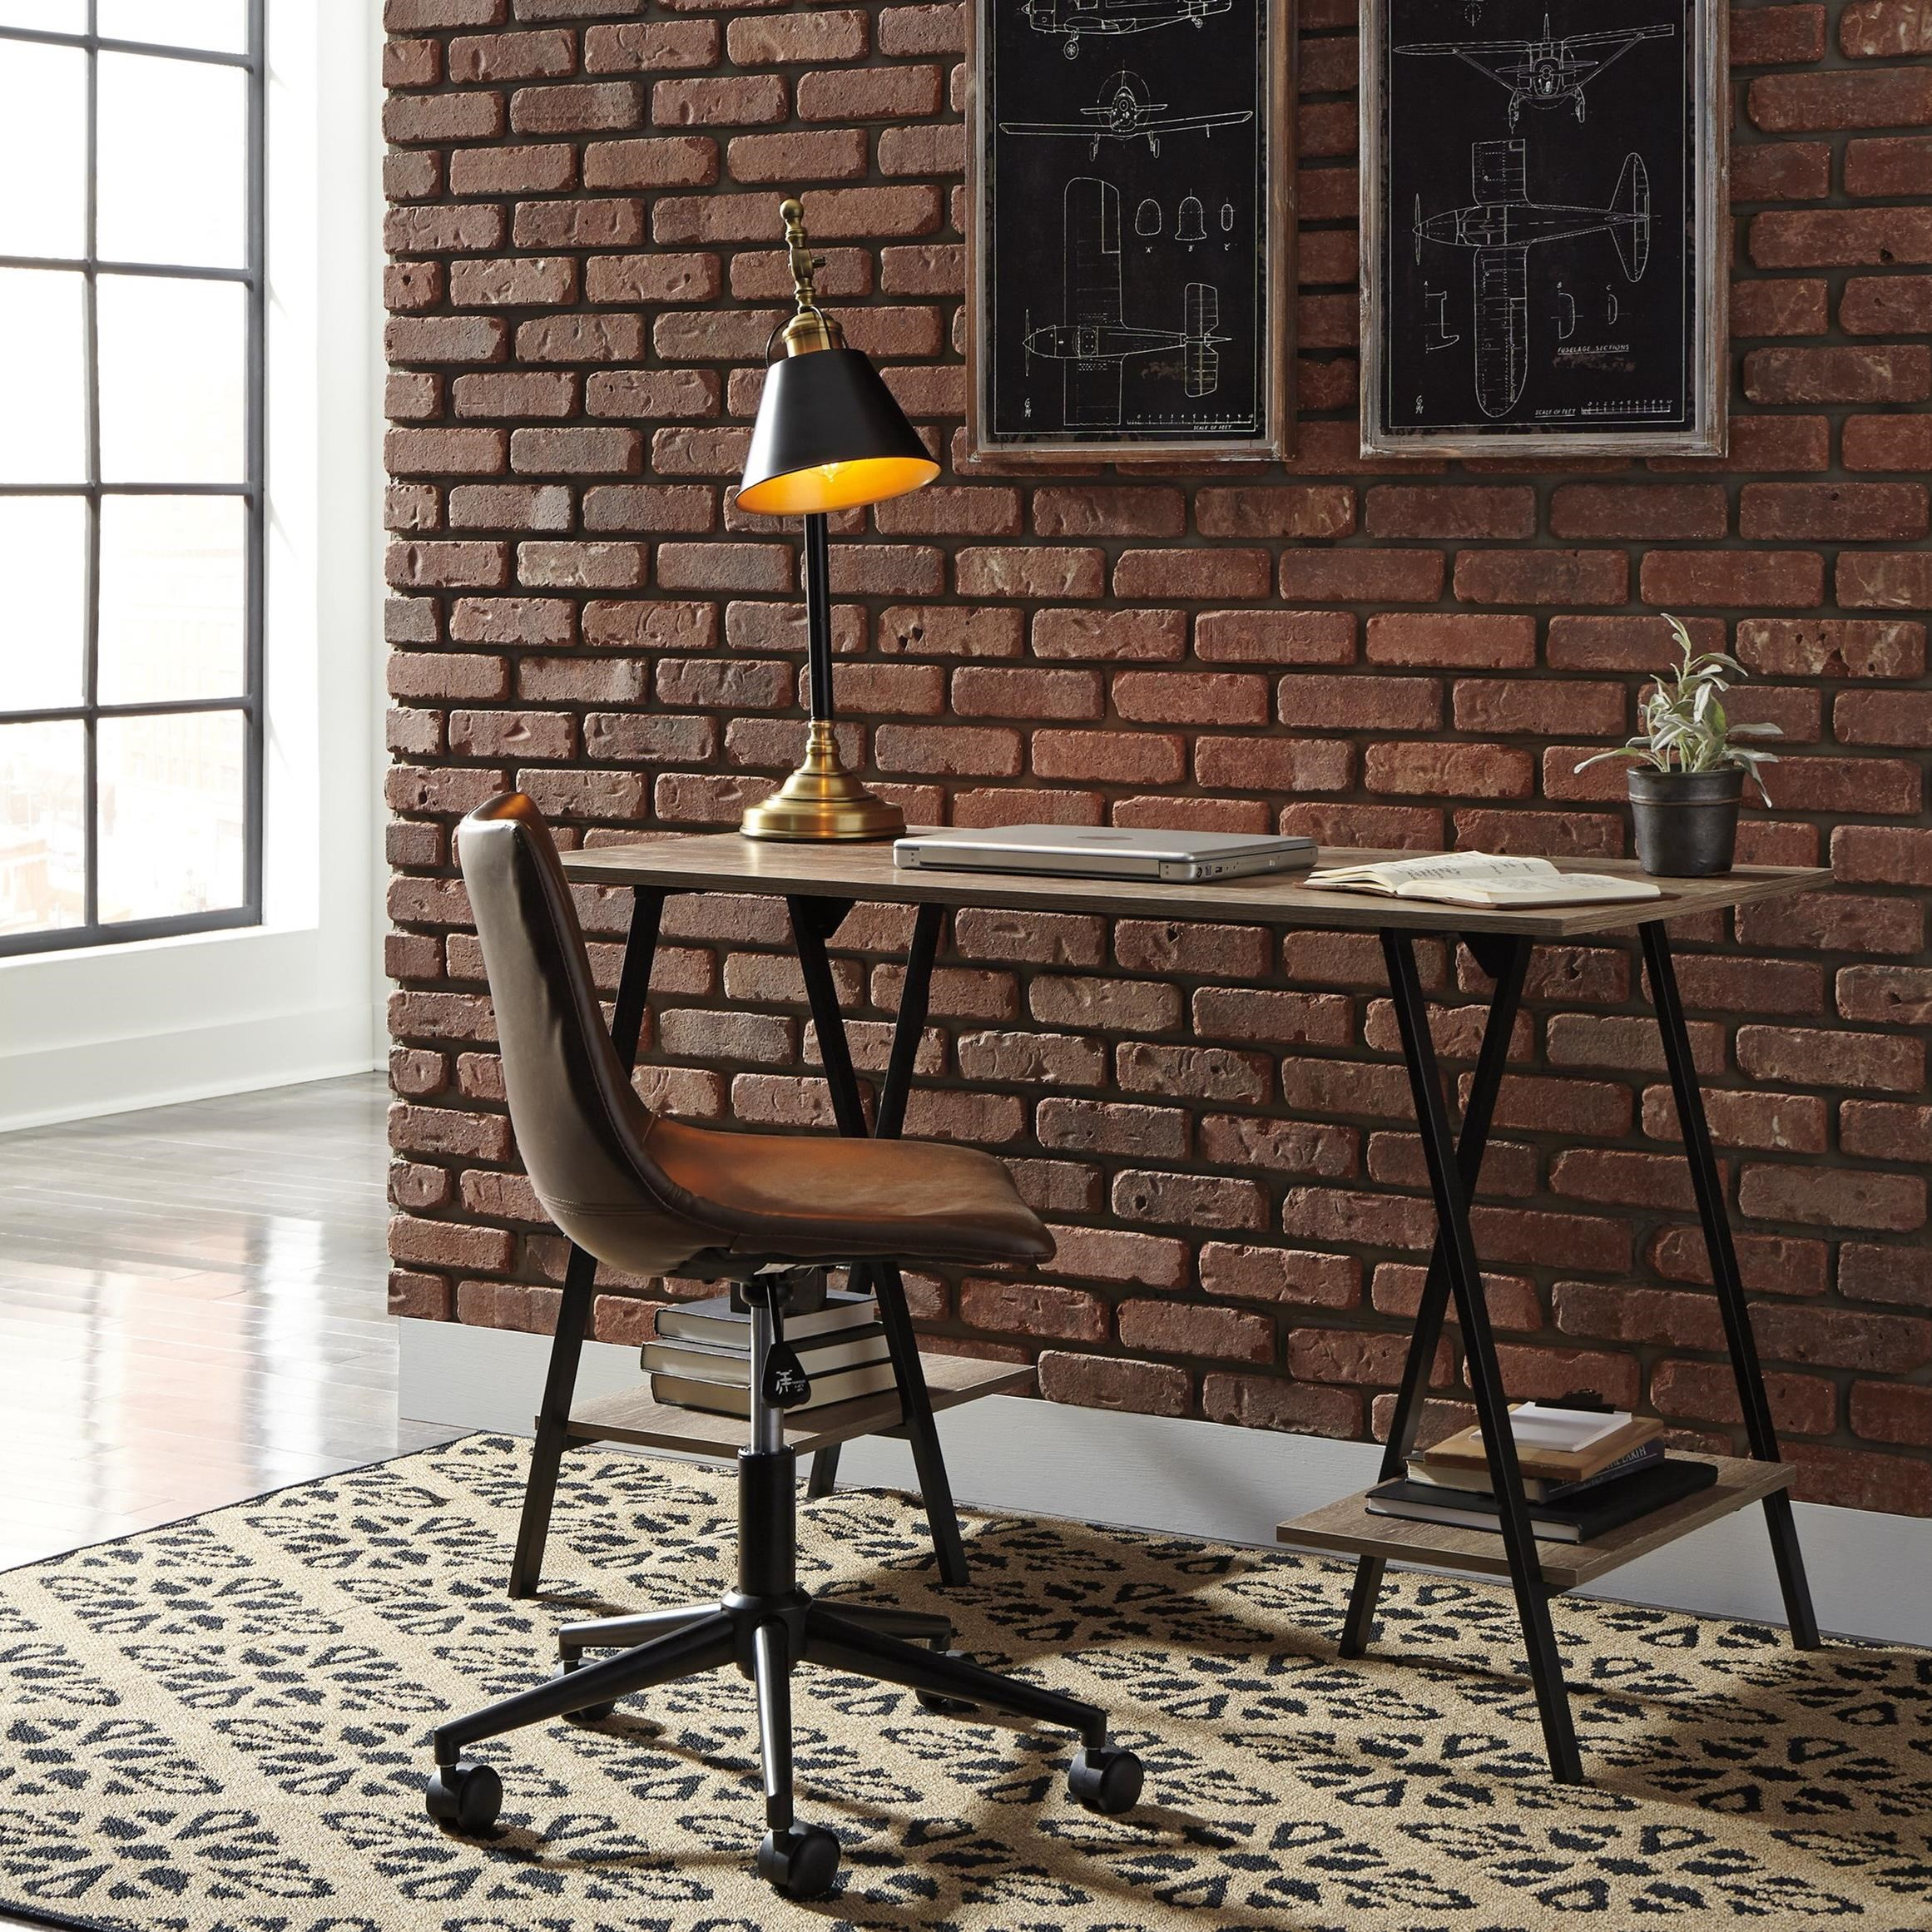 Signature Home Furnishings: Ashley Signature Design Bertmond H300-310 Industrial Home